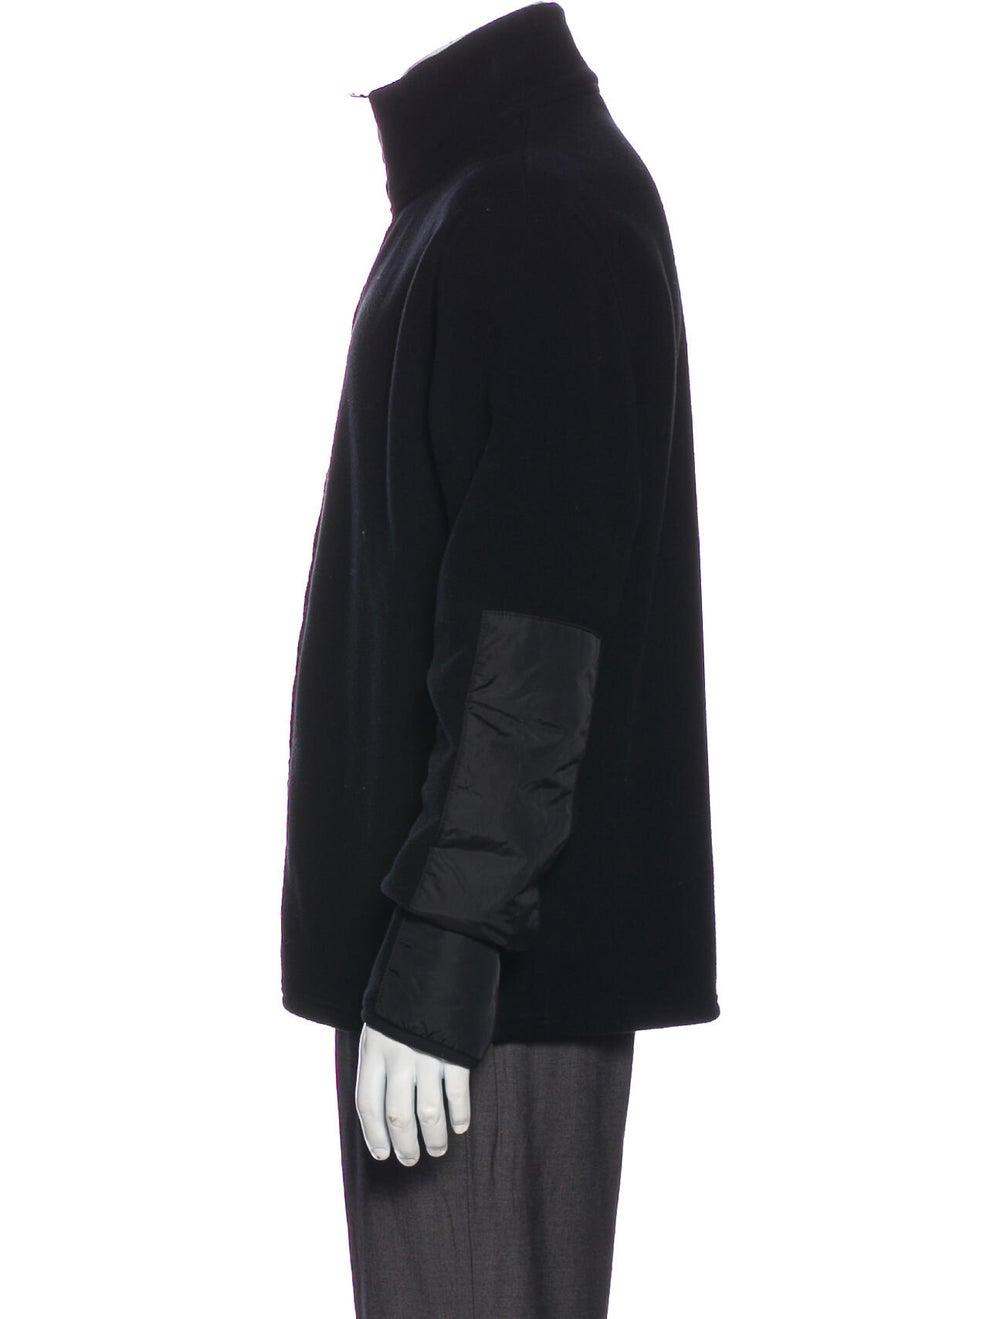 Prada Sport Jacket Black - image 2